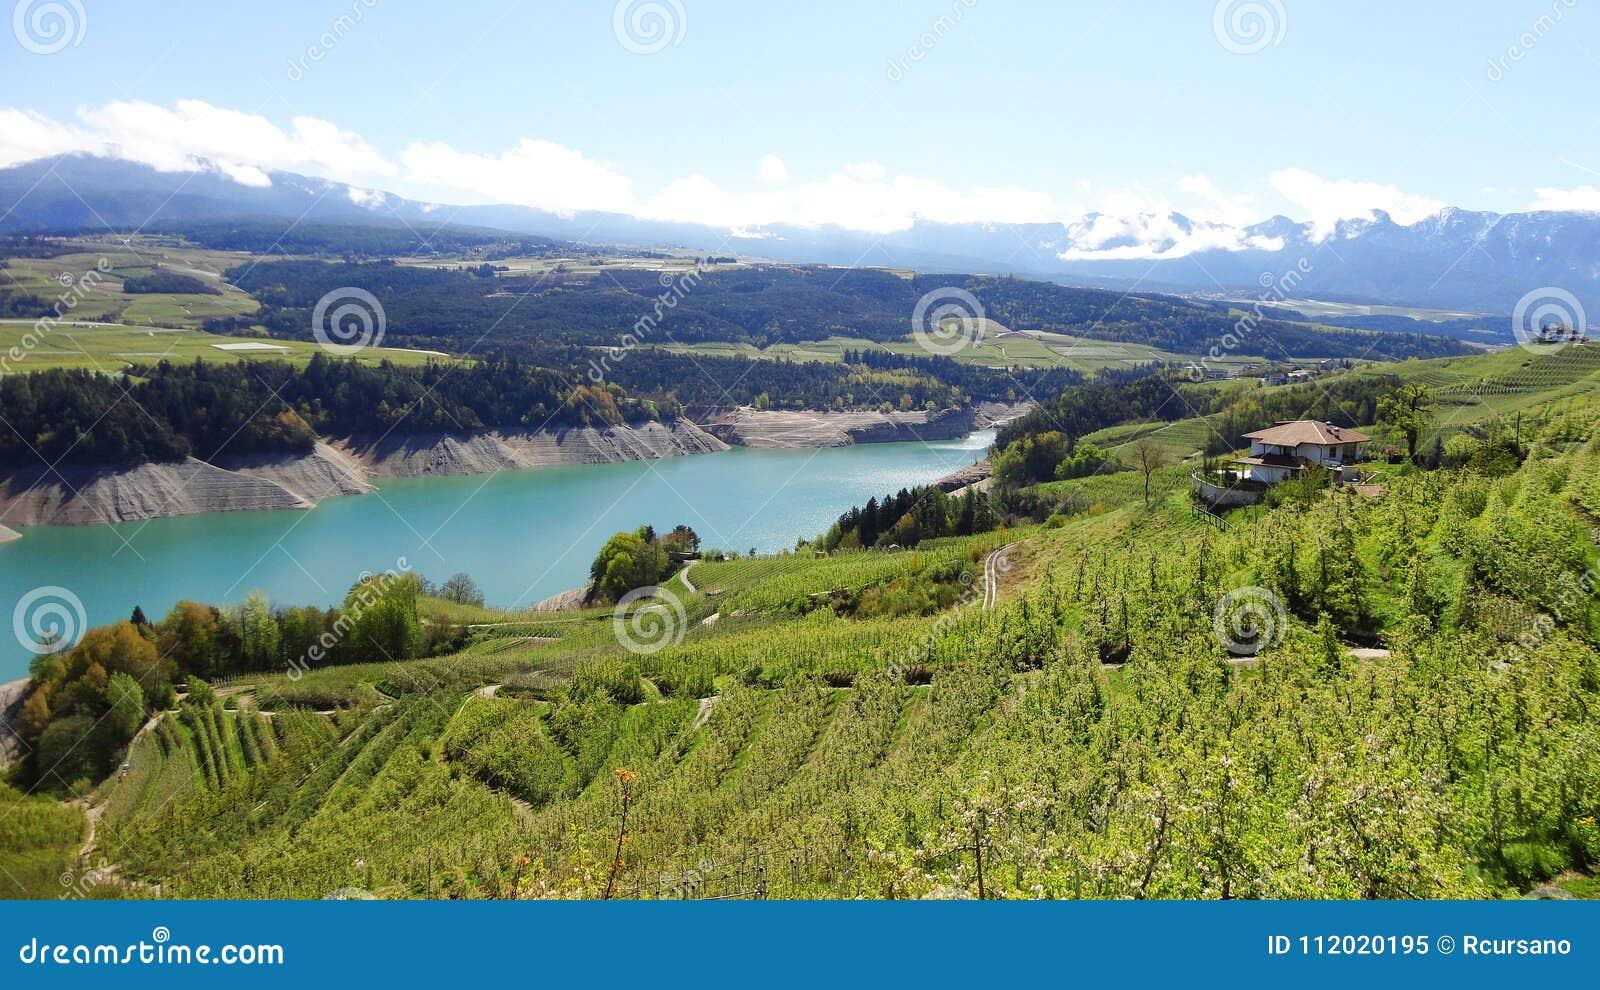 Италия, Trentino: Озеро Санта Giustina